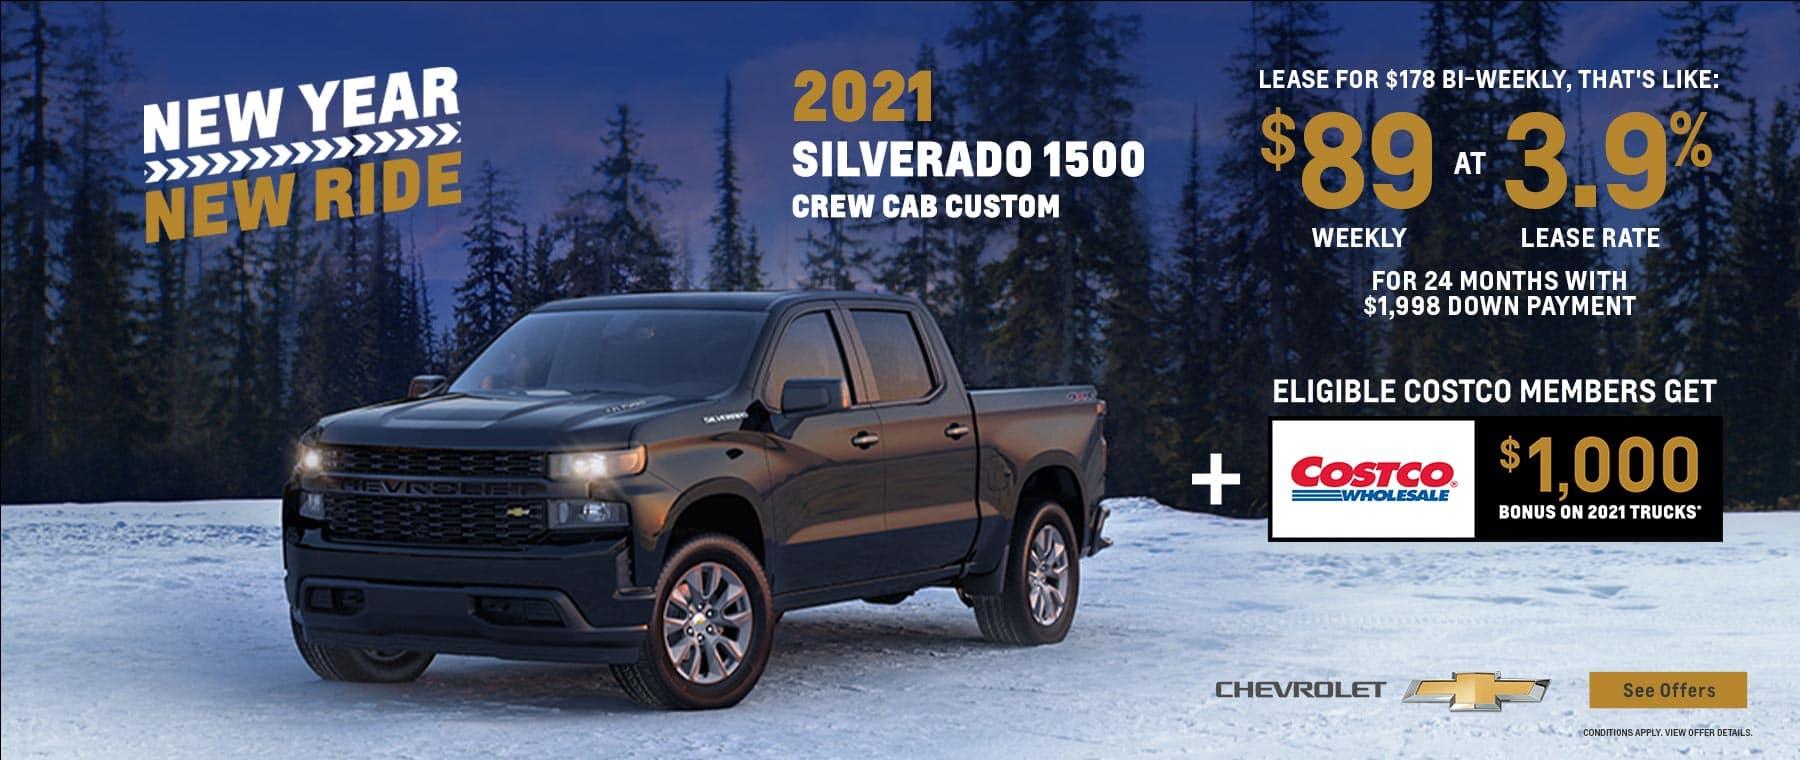 2021_JAN_WST_Chevy_T3_EN_1800x760_TRUCK_SILVERADO-LD-ABPR